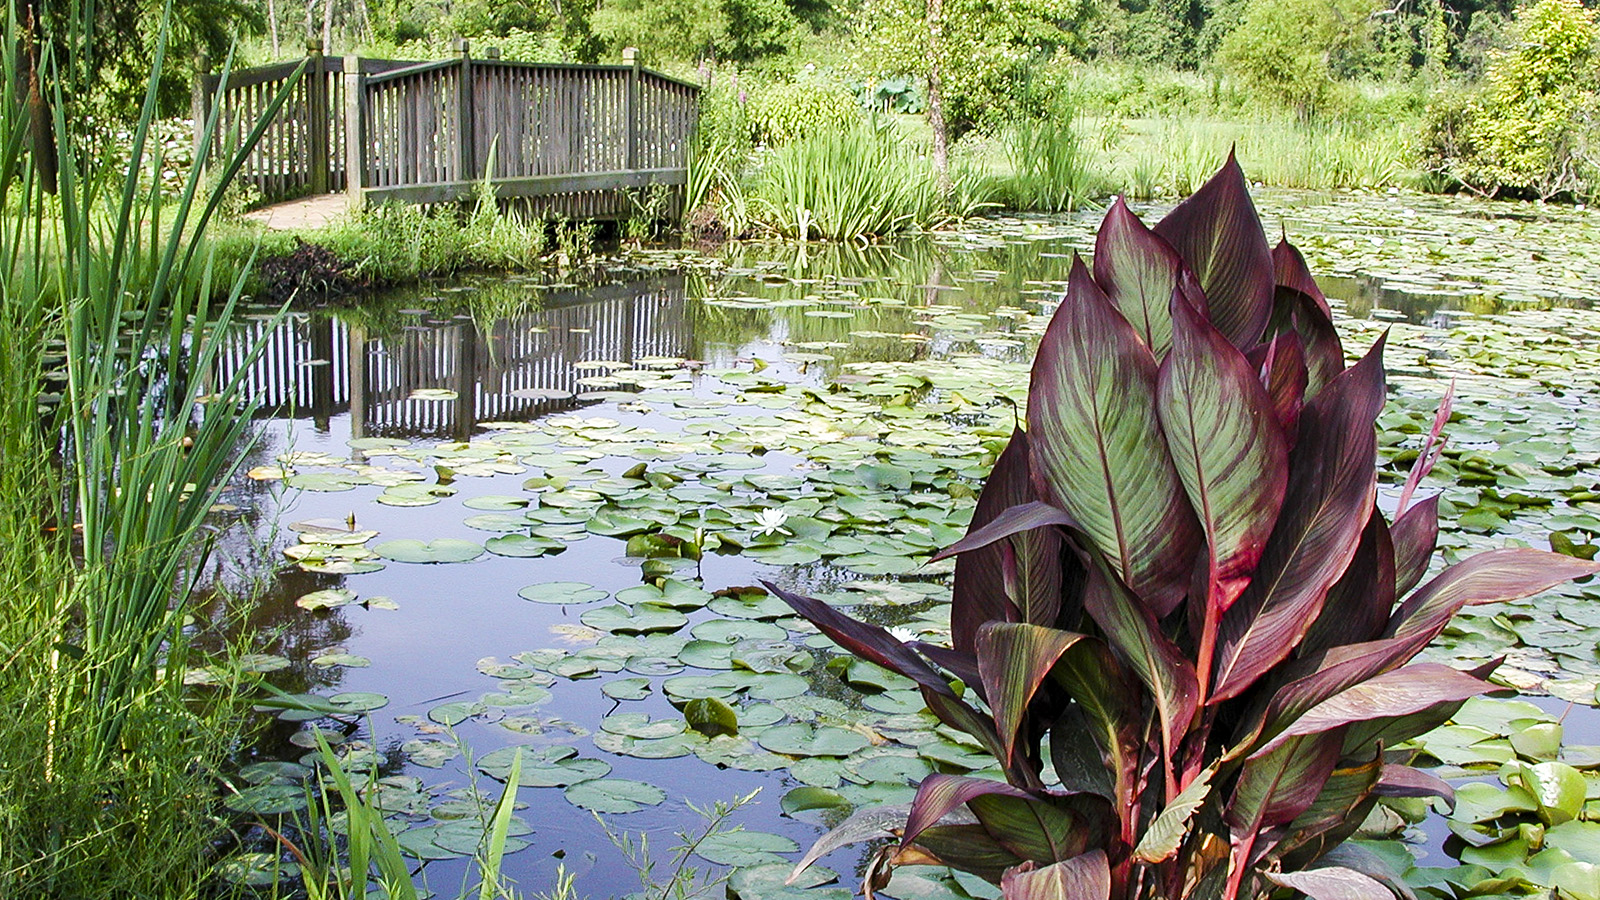 Kenilworth Aquatic Gardens The Cultural Landscape Foundation